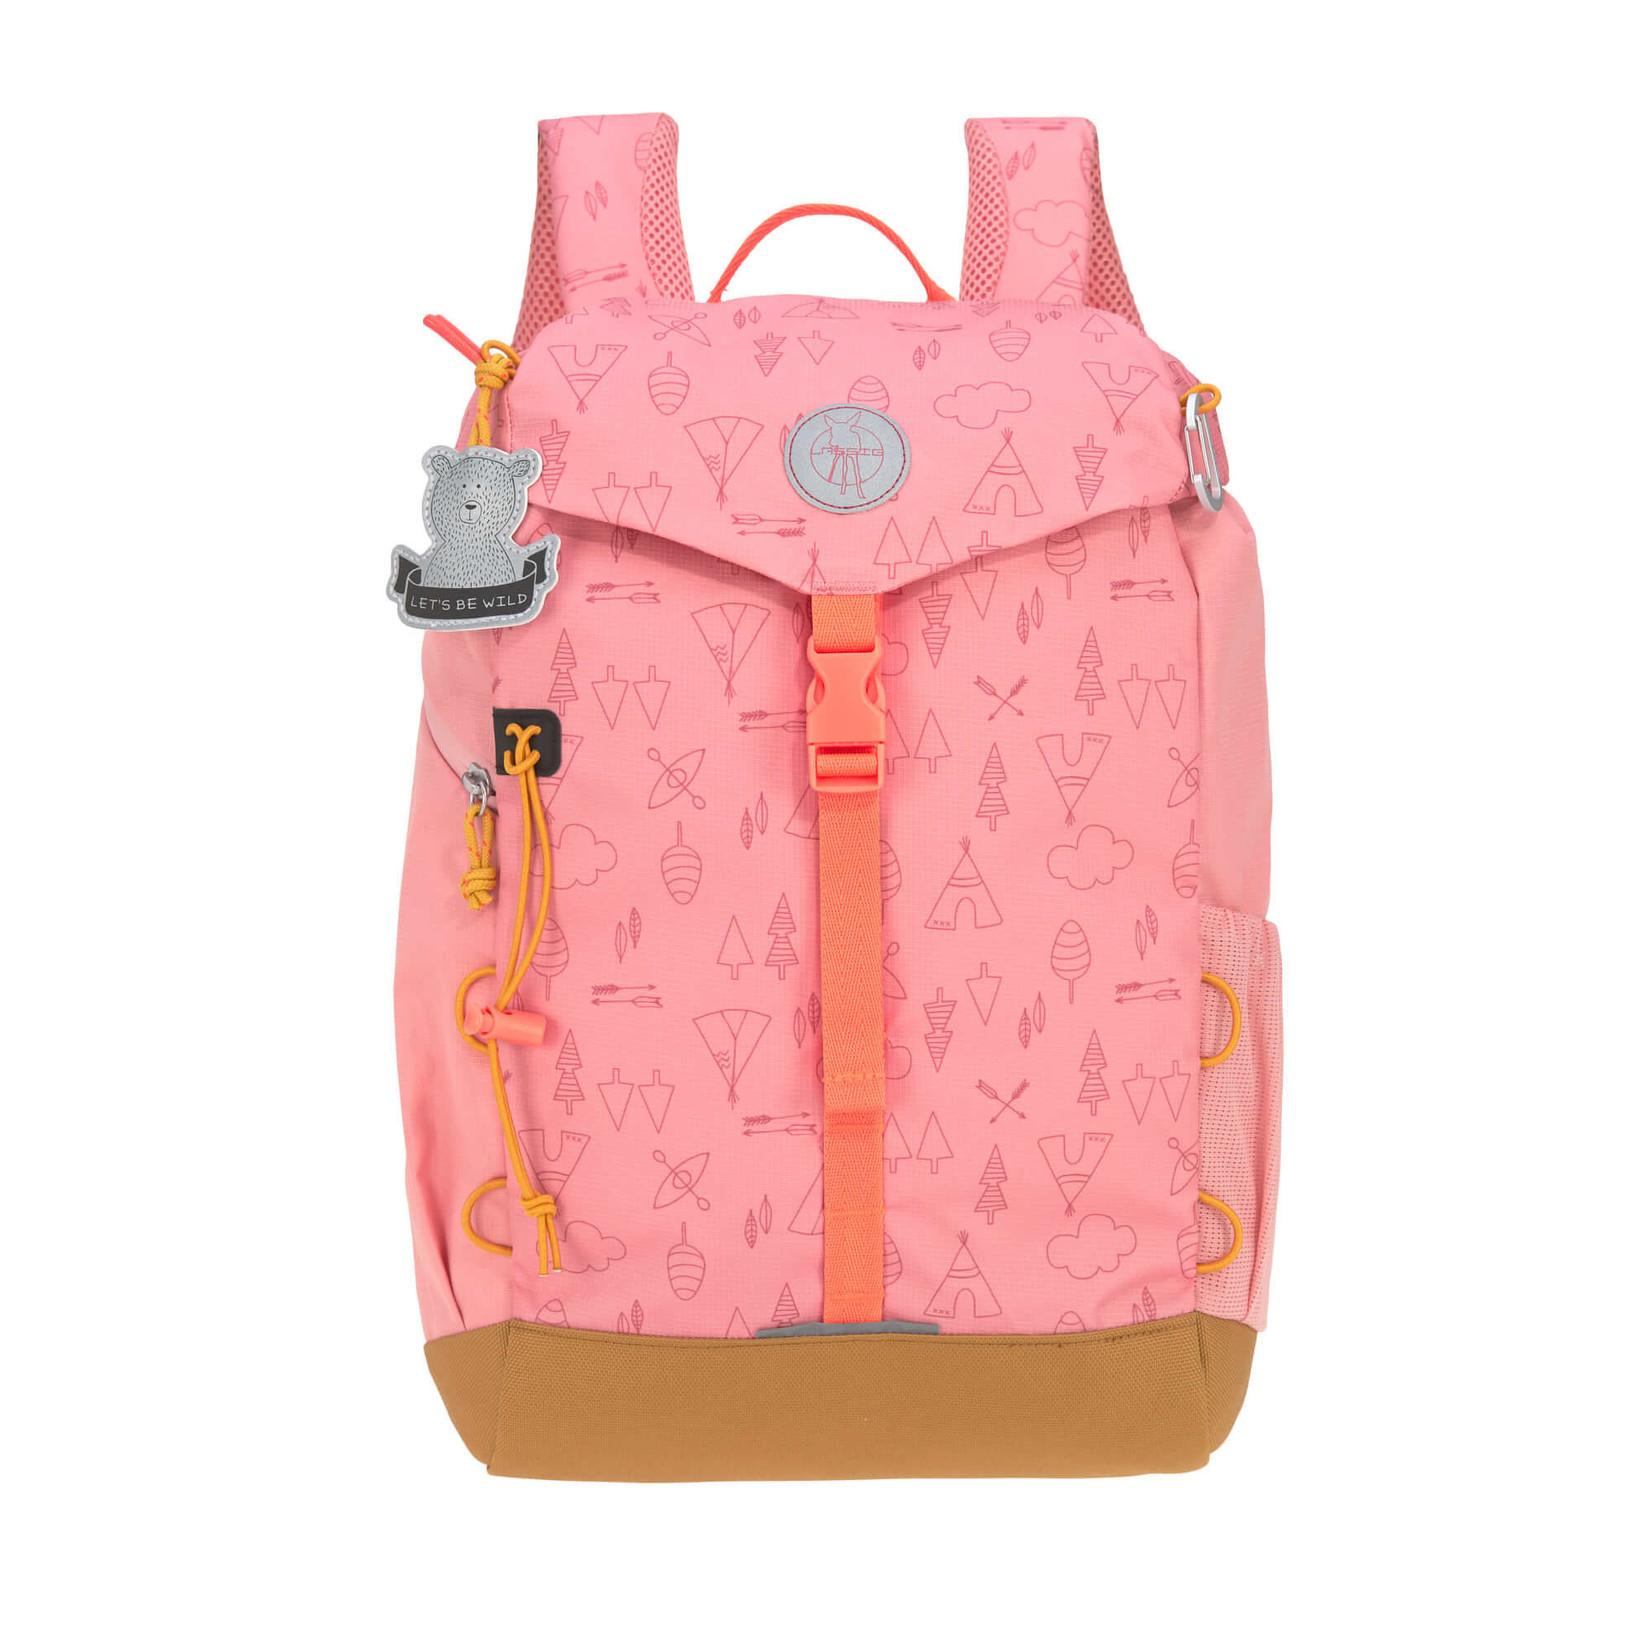 Lässig Fashion Lässig Outdoor-Kinderrucksack | 14 l | Rosa, Braun